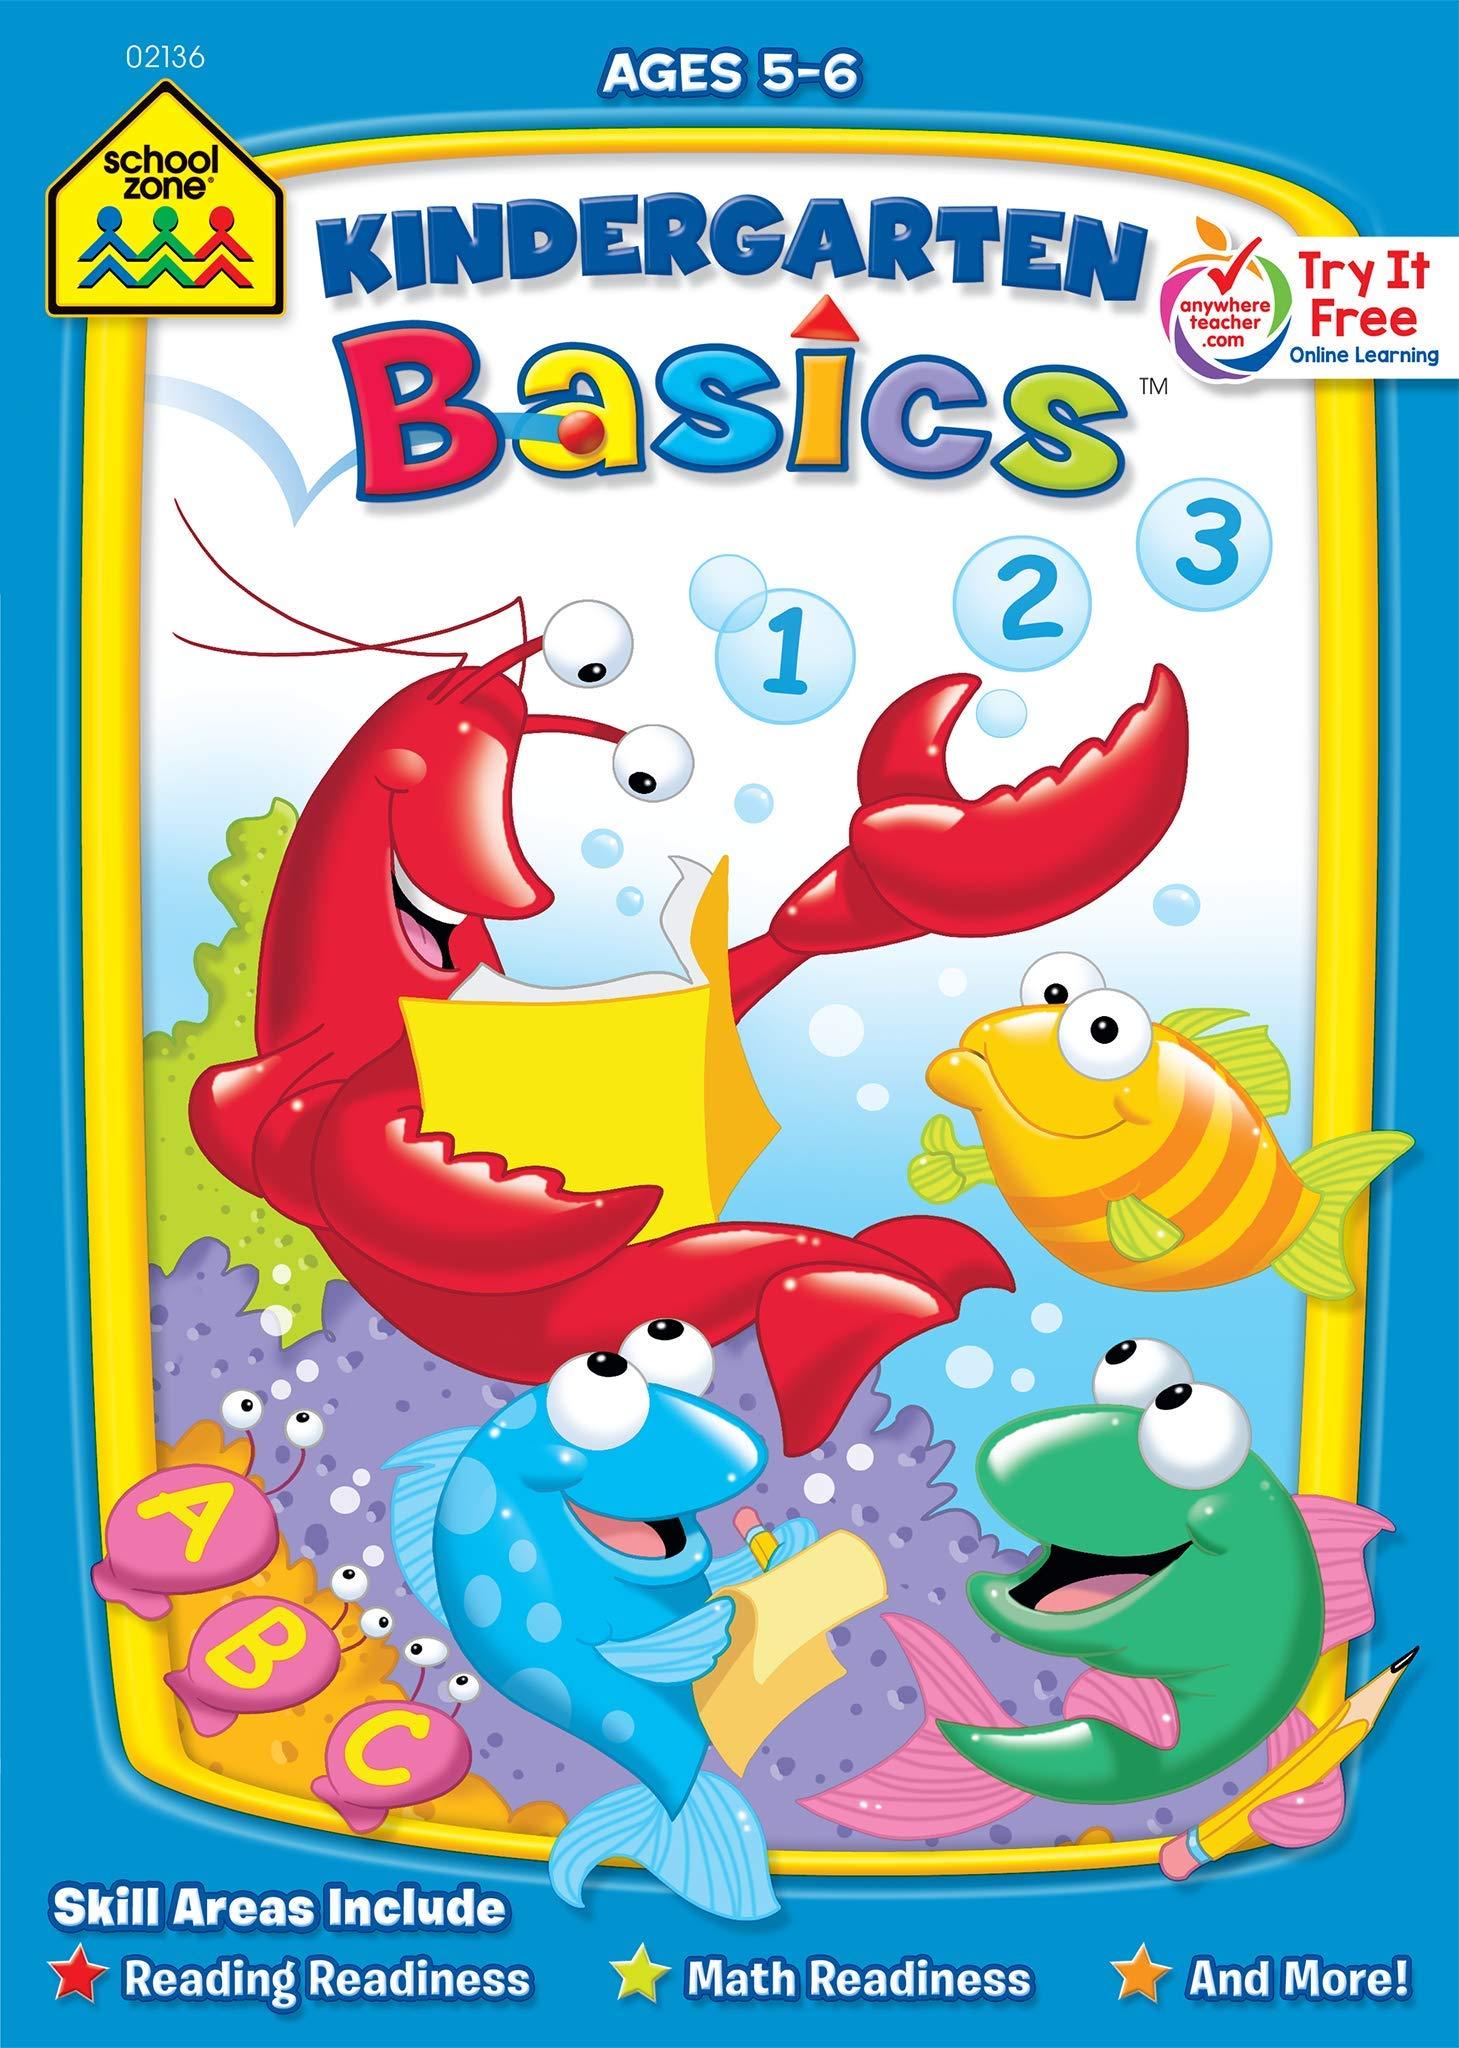 Amazon.com: School Zone - Kindergarten Basics Workbook - 32 ...